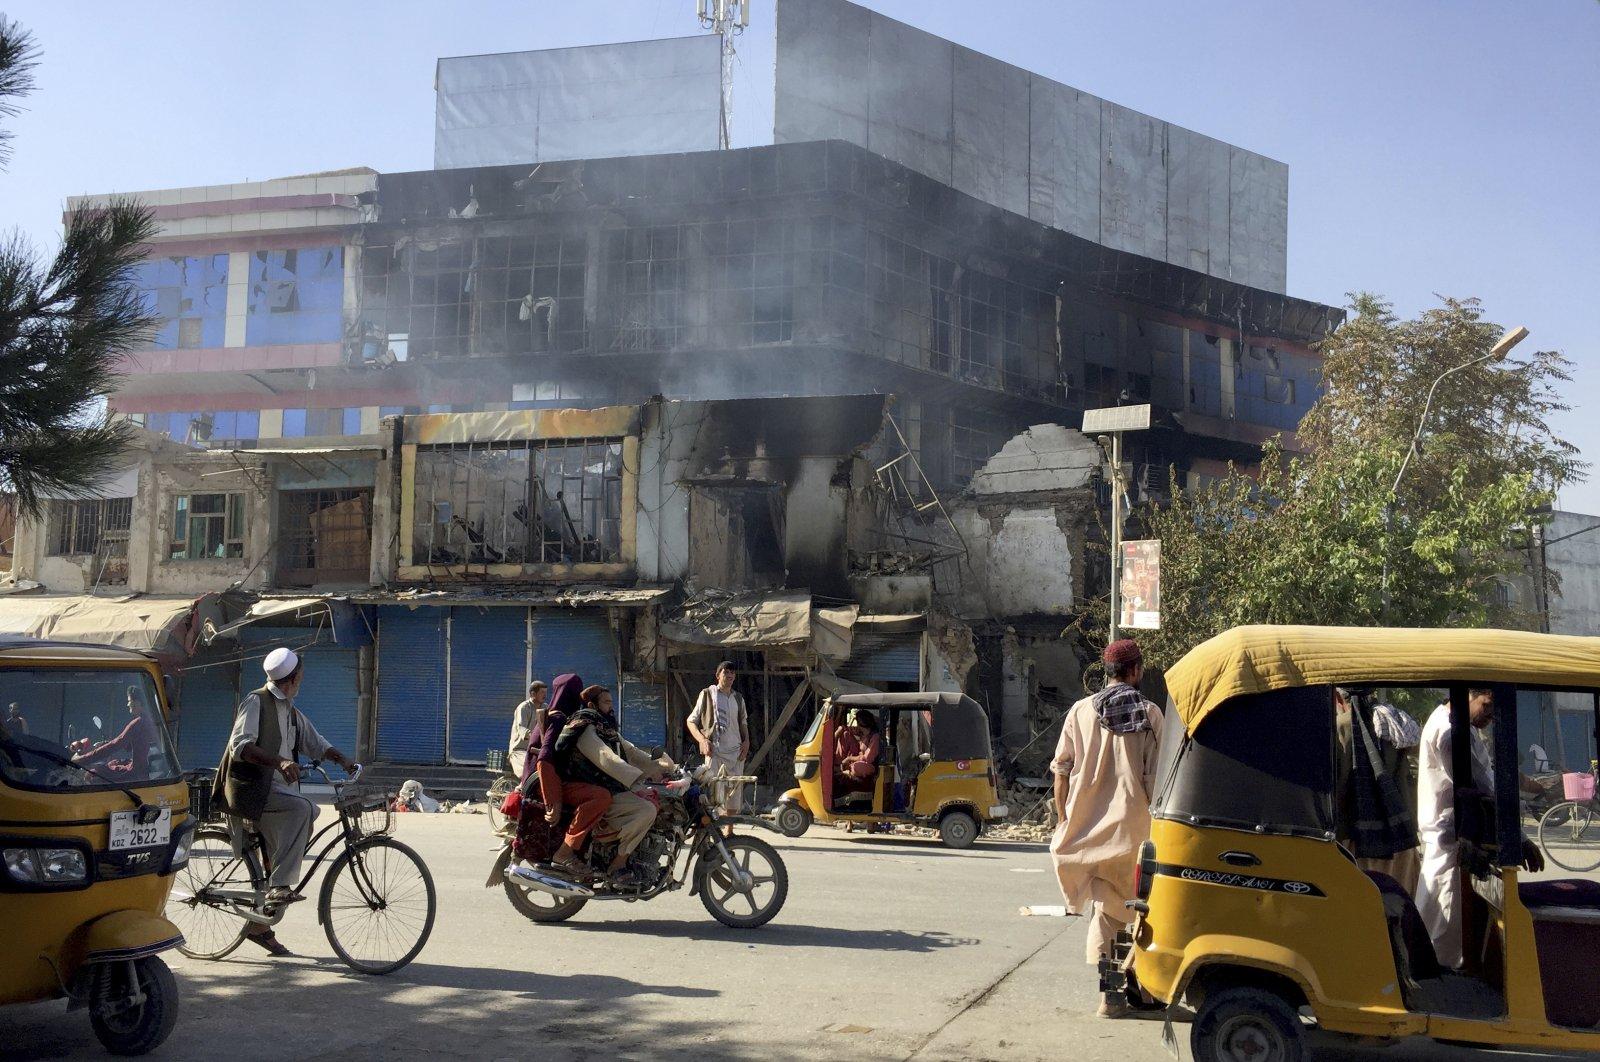 Taliban take over radio station after capturing Afghan city